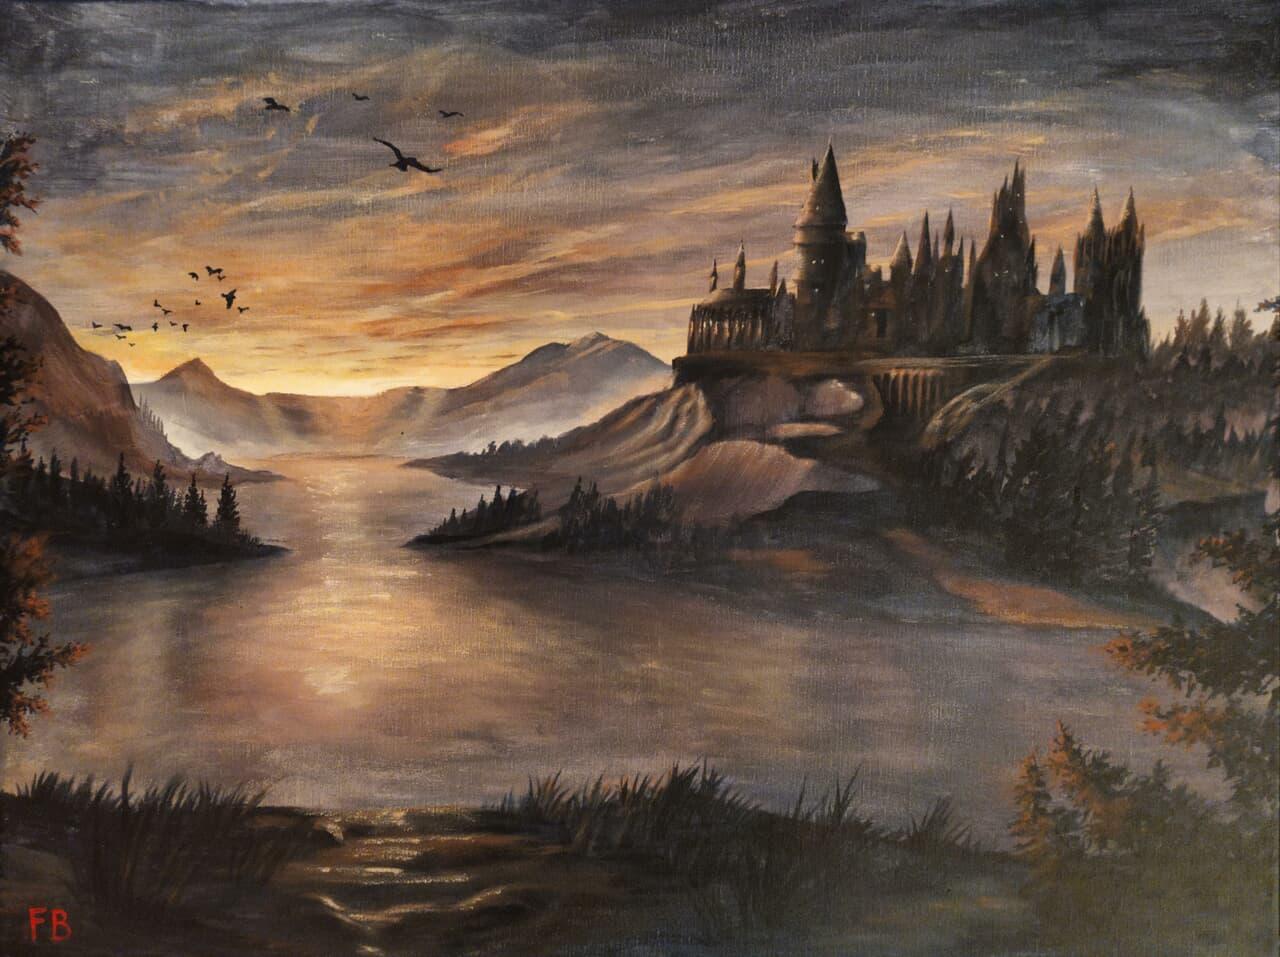 fantasy, hp, and article image